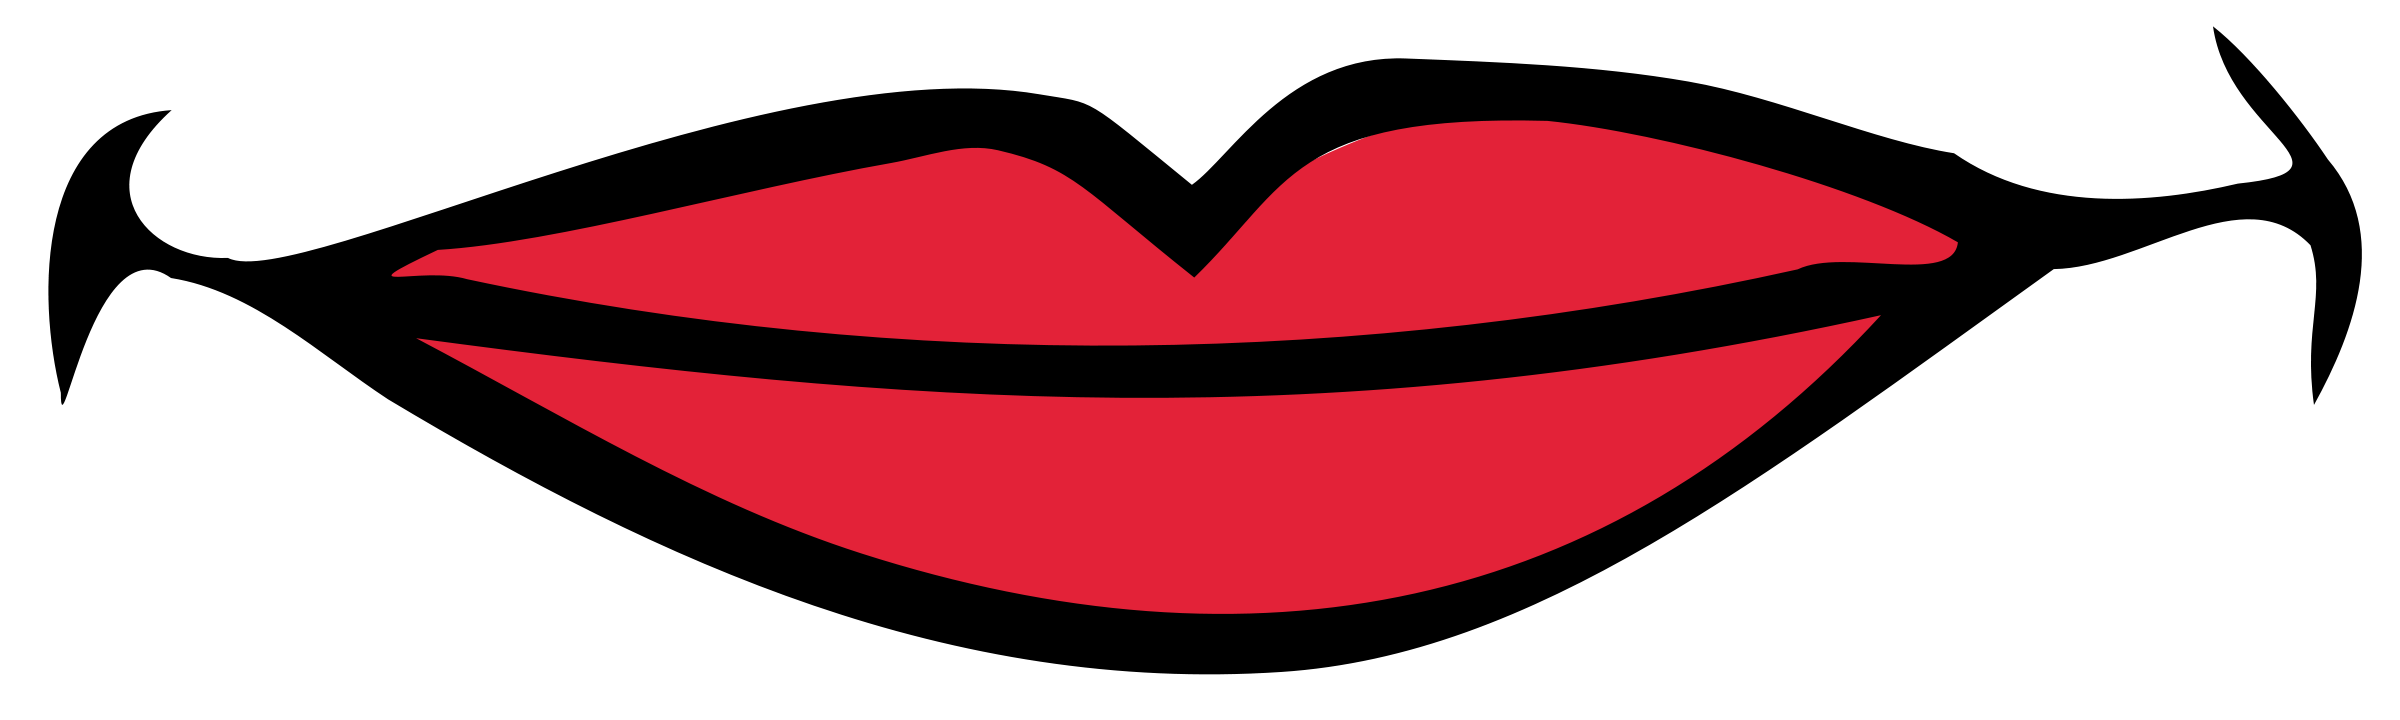 mouth smile clip art-mouth smile clip art-7